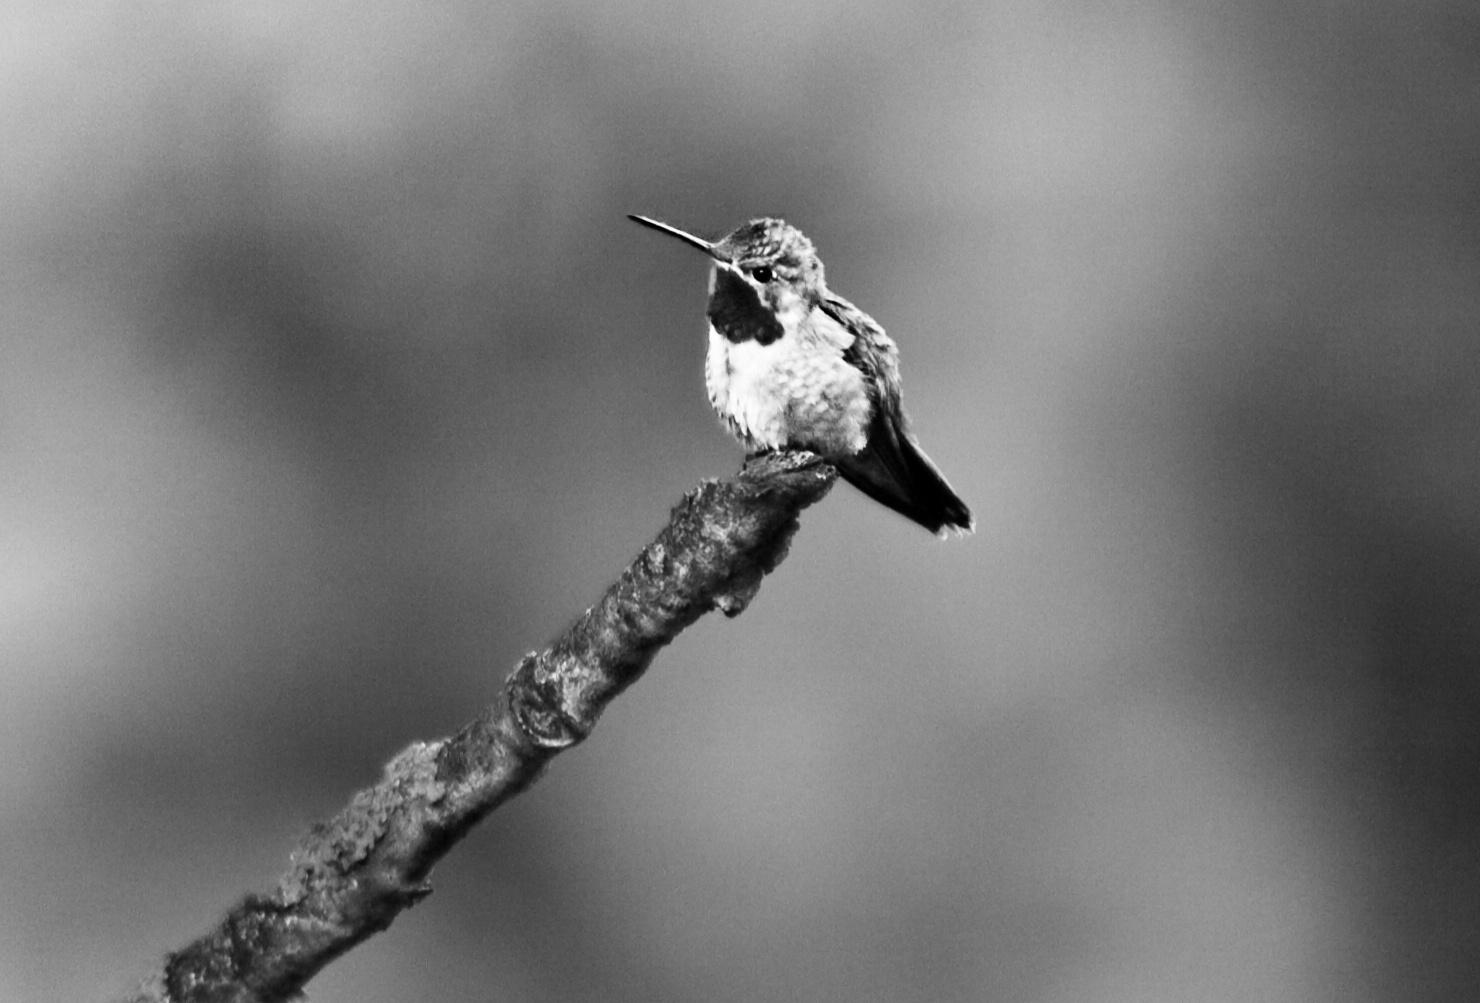 cabin Humming bird_Snapseed.jpg